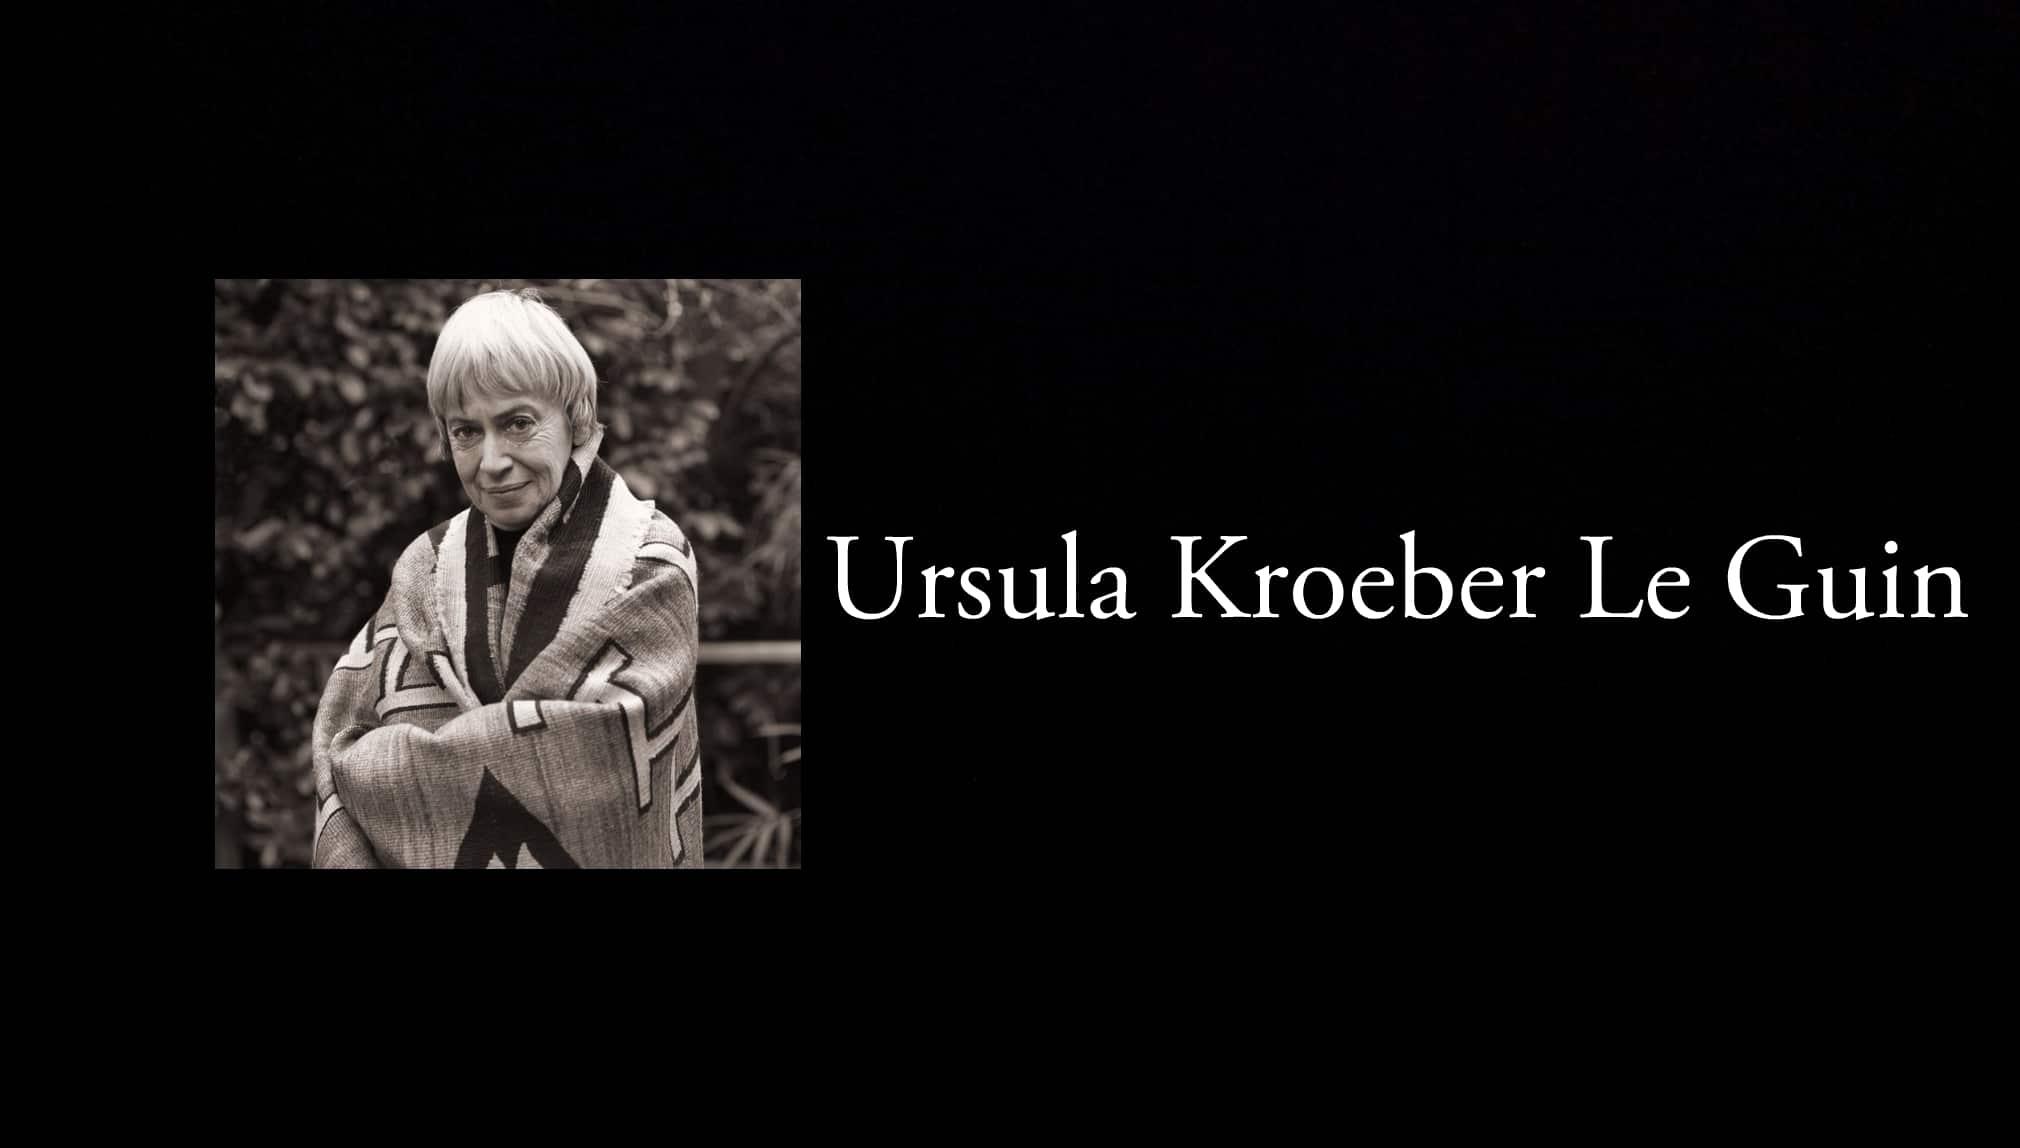 Ursula Kroeber Le Guin.